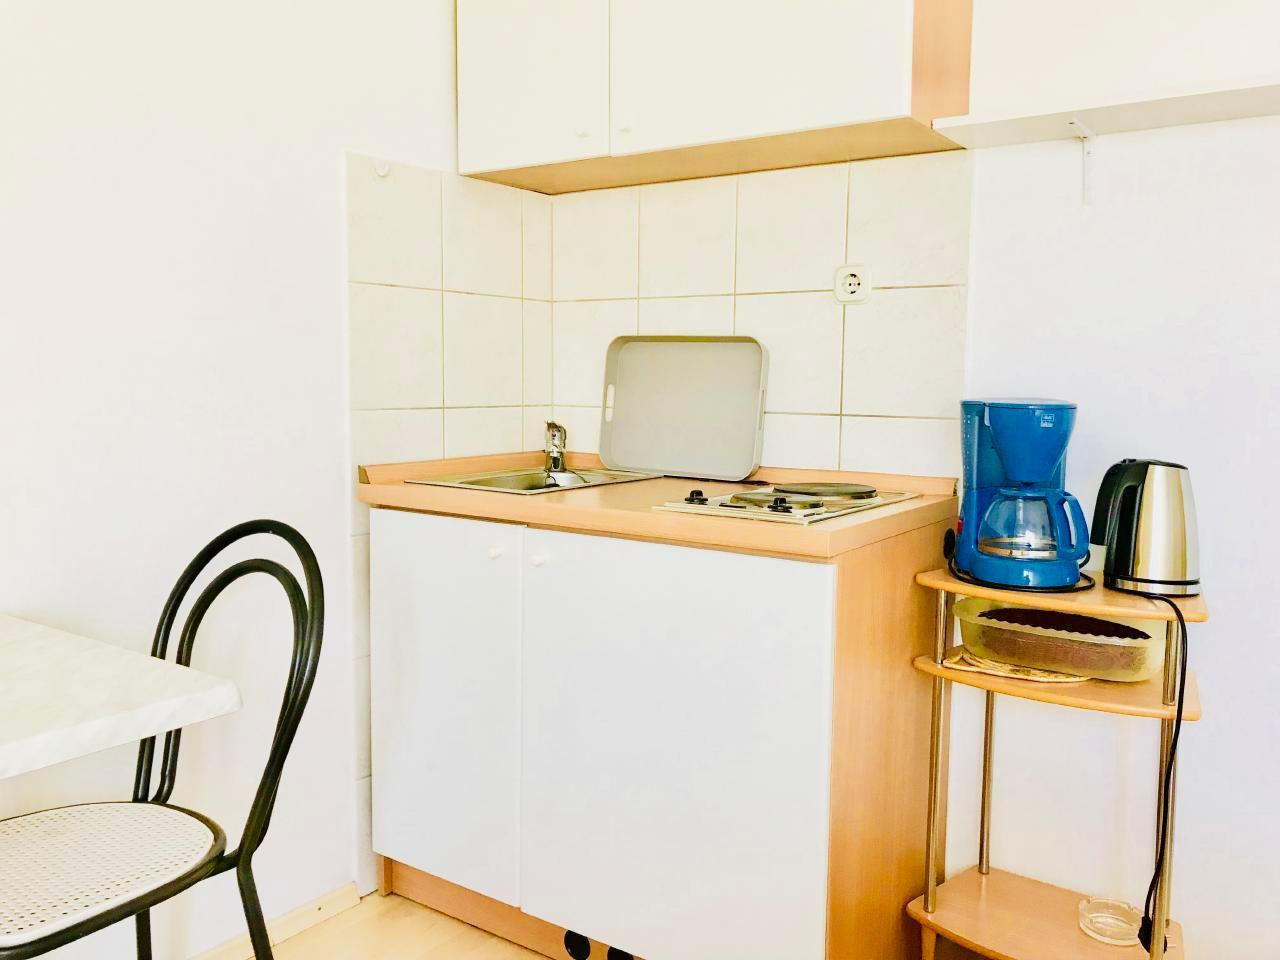 Ferienwohnung Apartmenthaus Ruza 4 - Studio (98392), Kaštel Štafilić, , Dalmatien, Kroatien, Bild 10